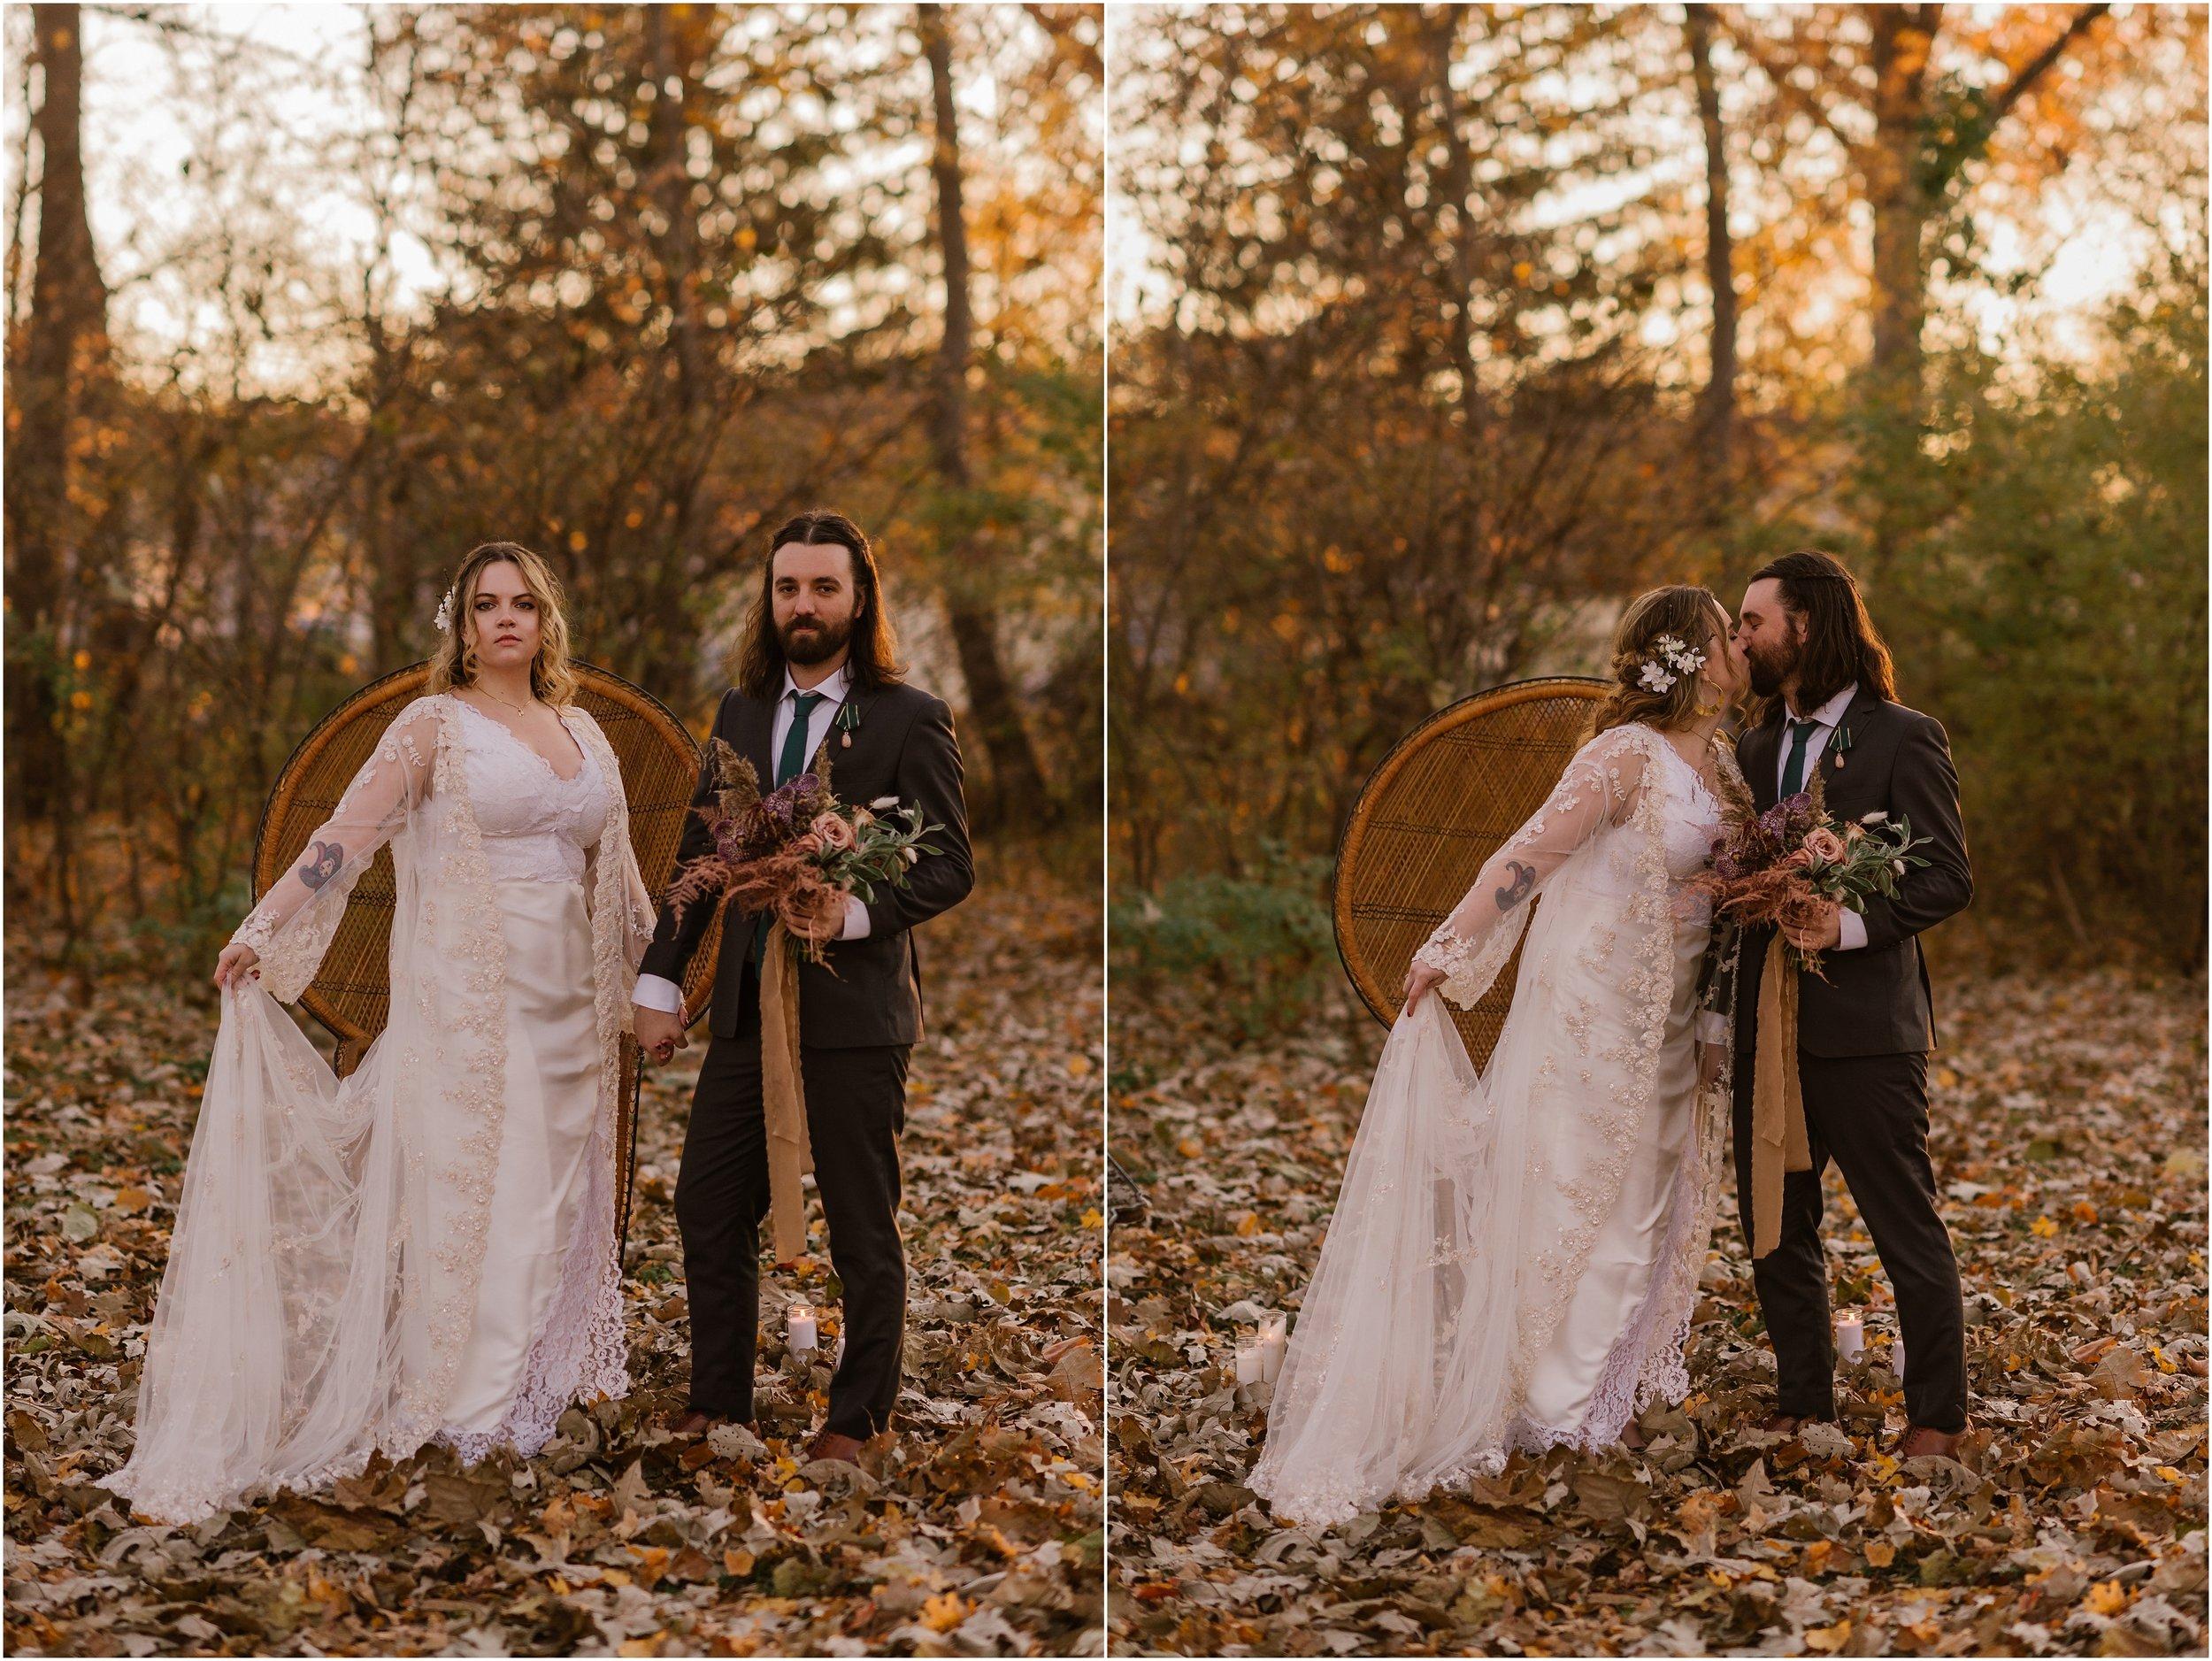 Rebecca_Shehorn_Photography_Indianapolis_Wedding_Photographer_9433.jpg